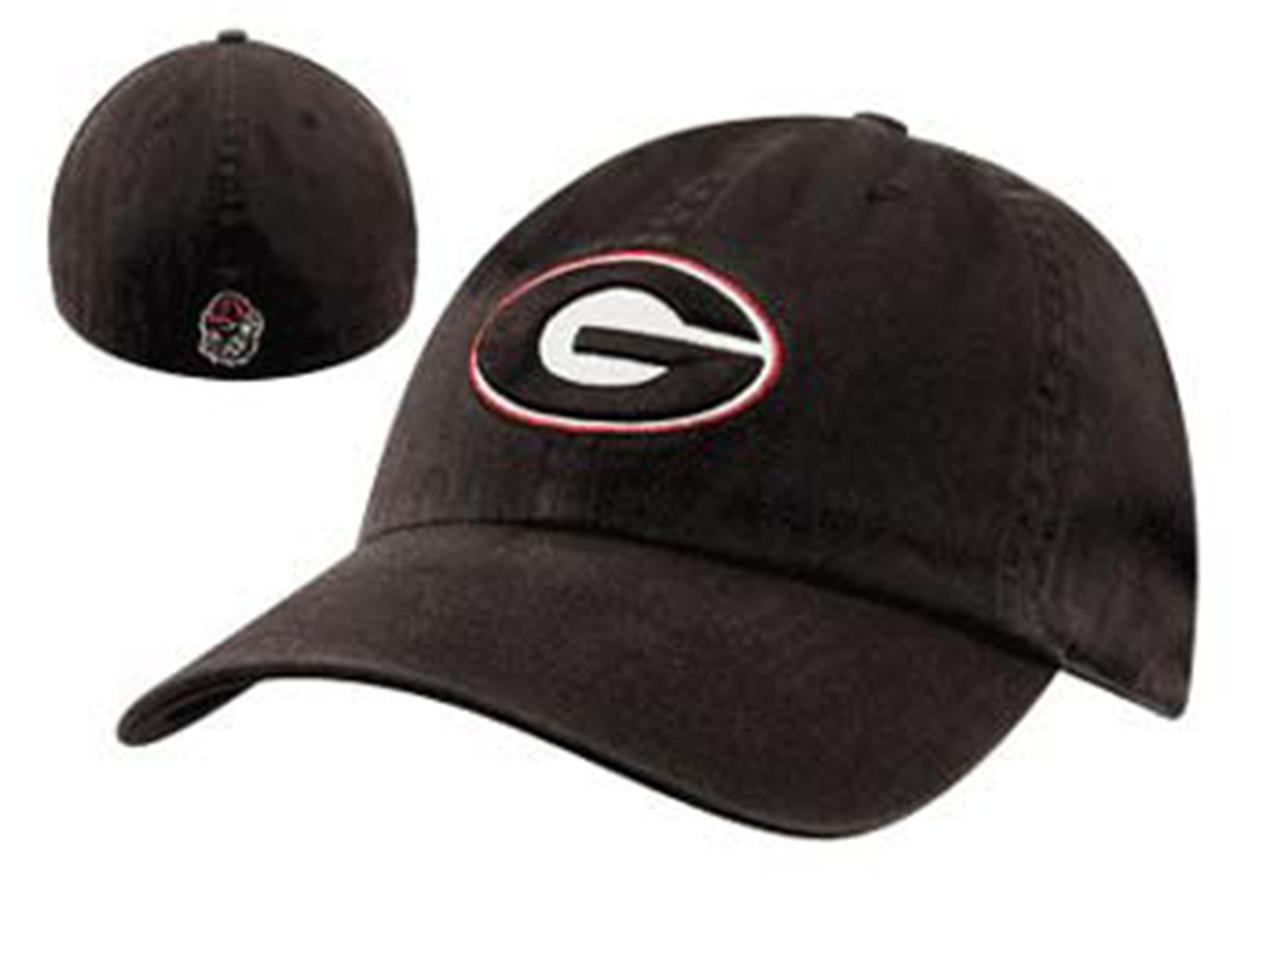 a6425b2b975 Georgia Bulldogs Black Franchise Fitted Hat - Trenz Shirt Company